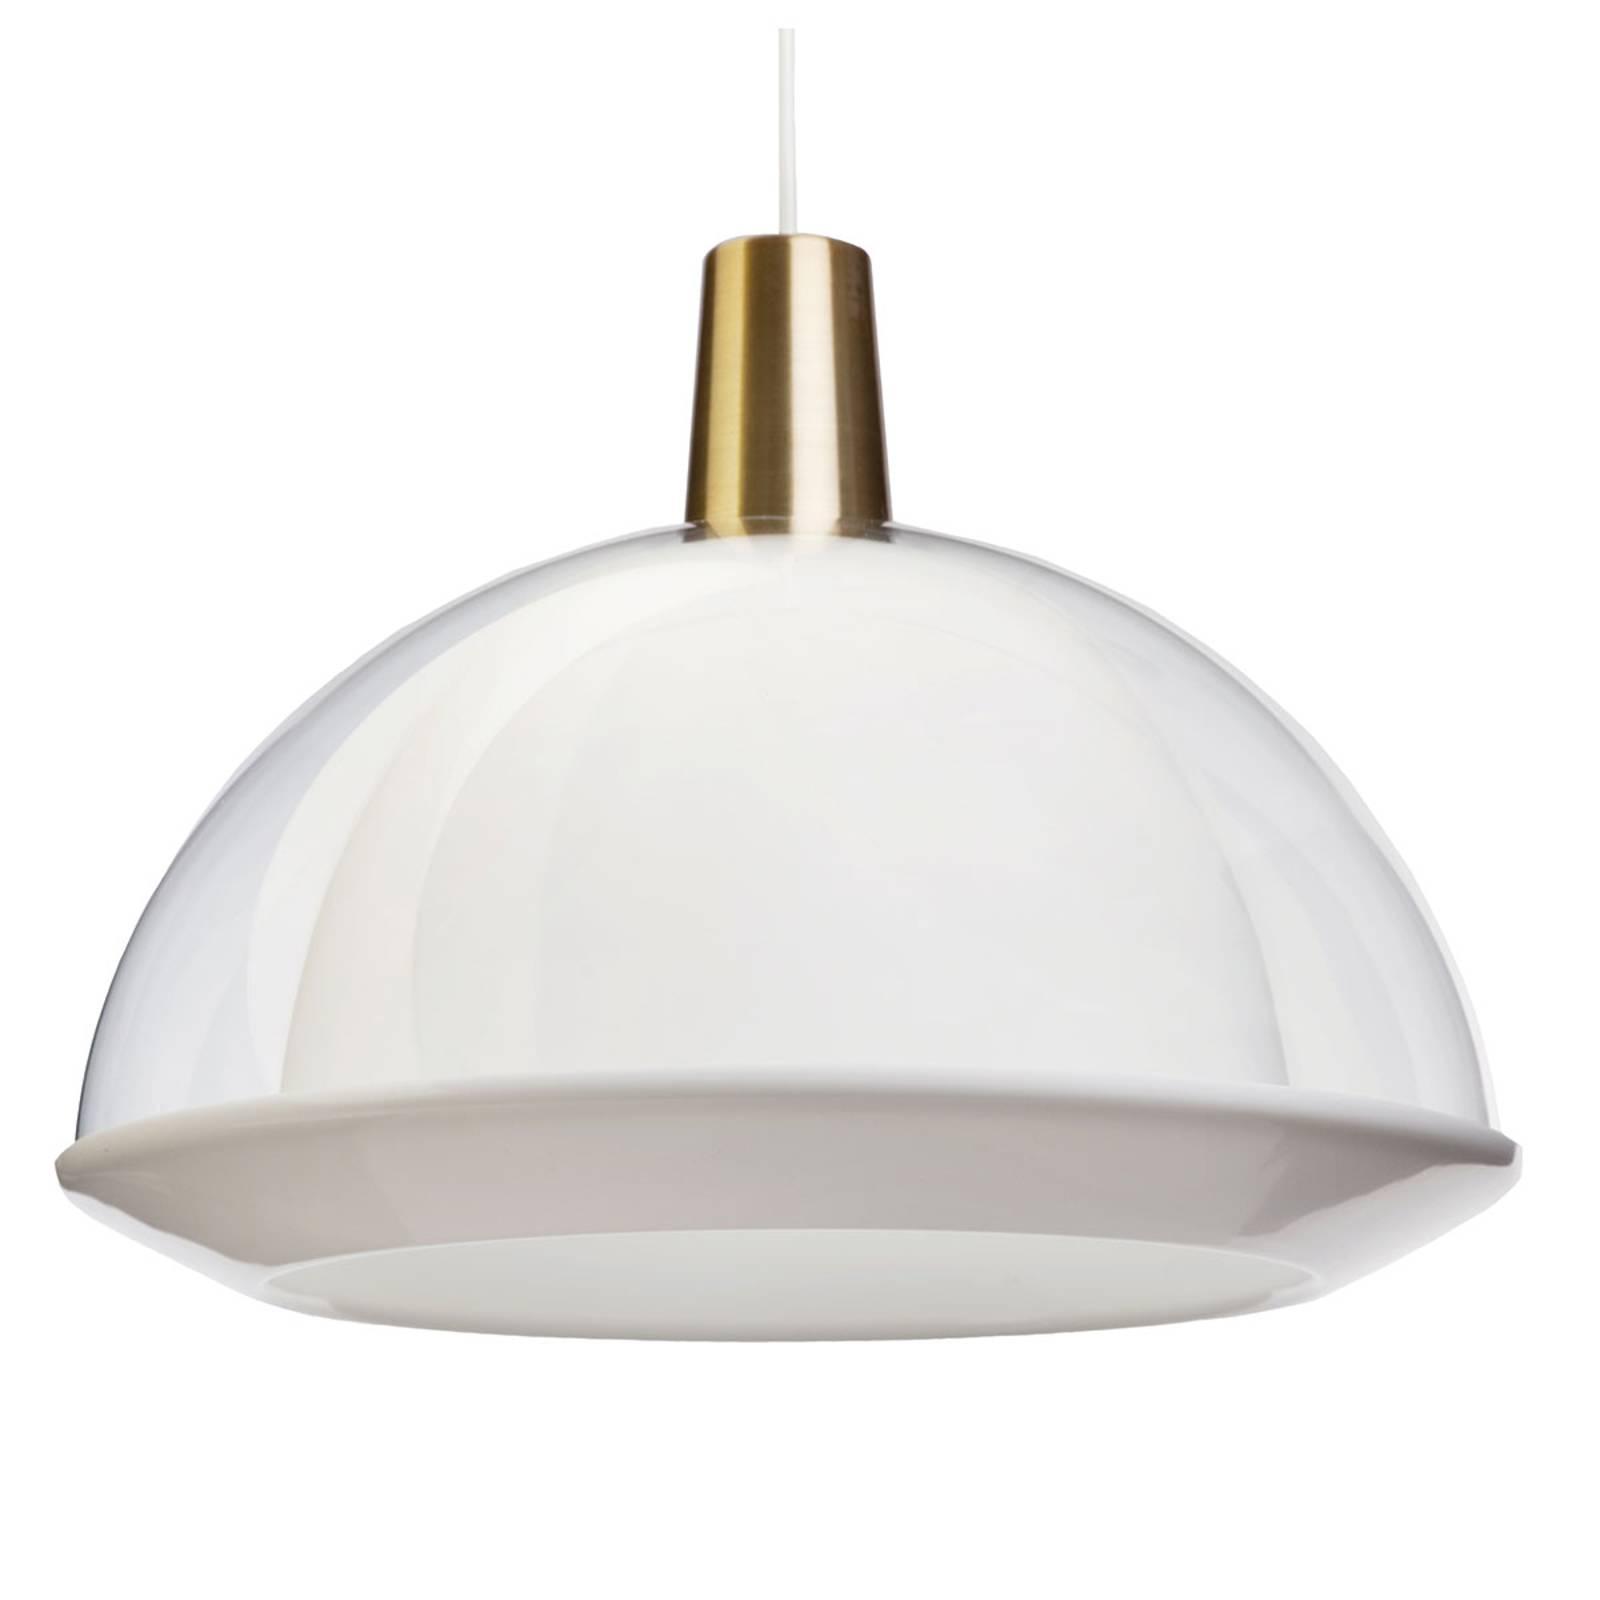 Innolux Kuplat 400 hanglamp 40 cm transparant